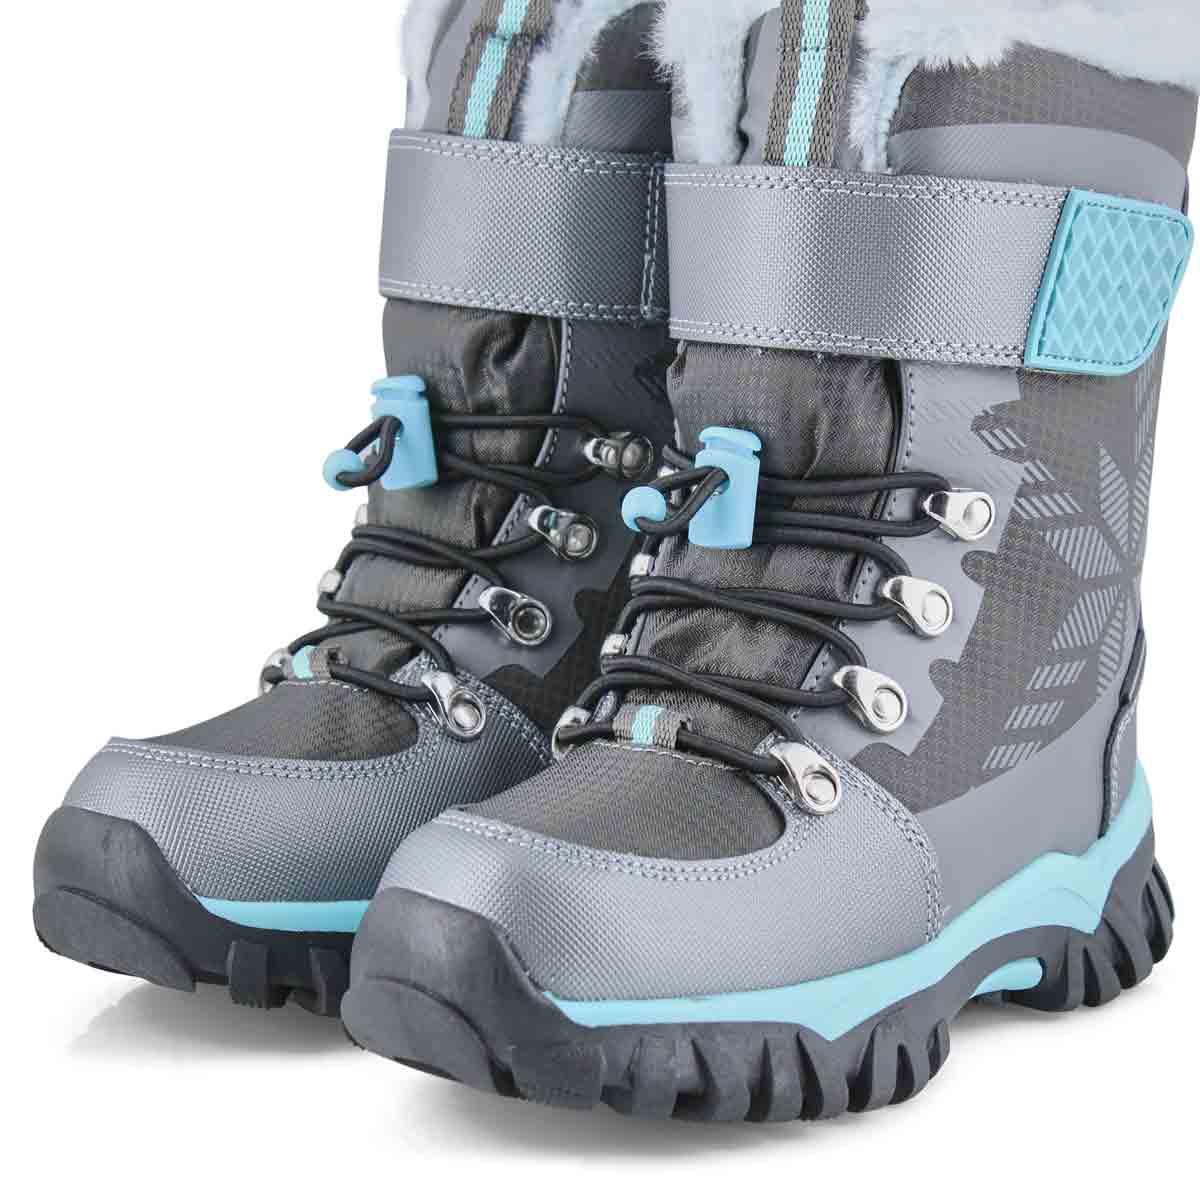 Girls' TOASTY pewter waterproof winter boots